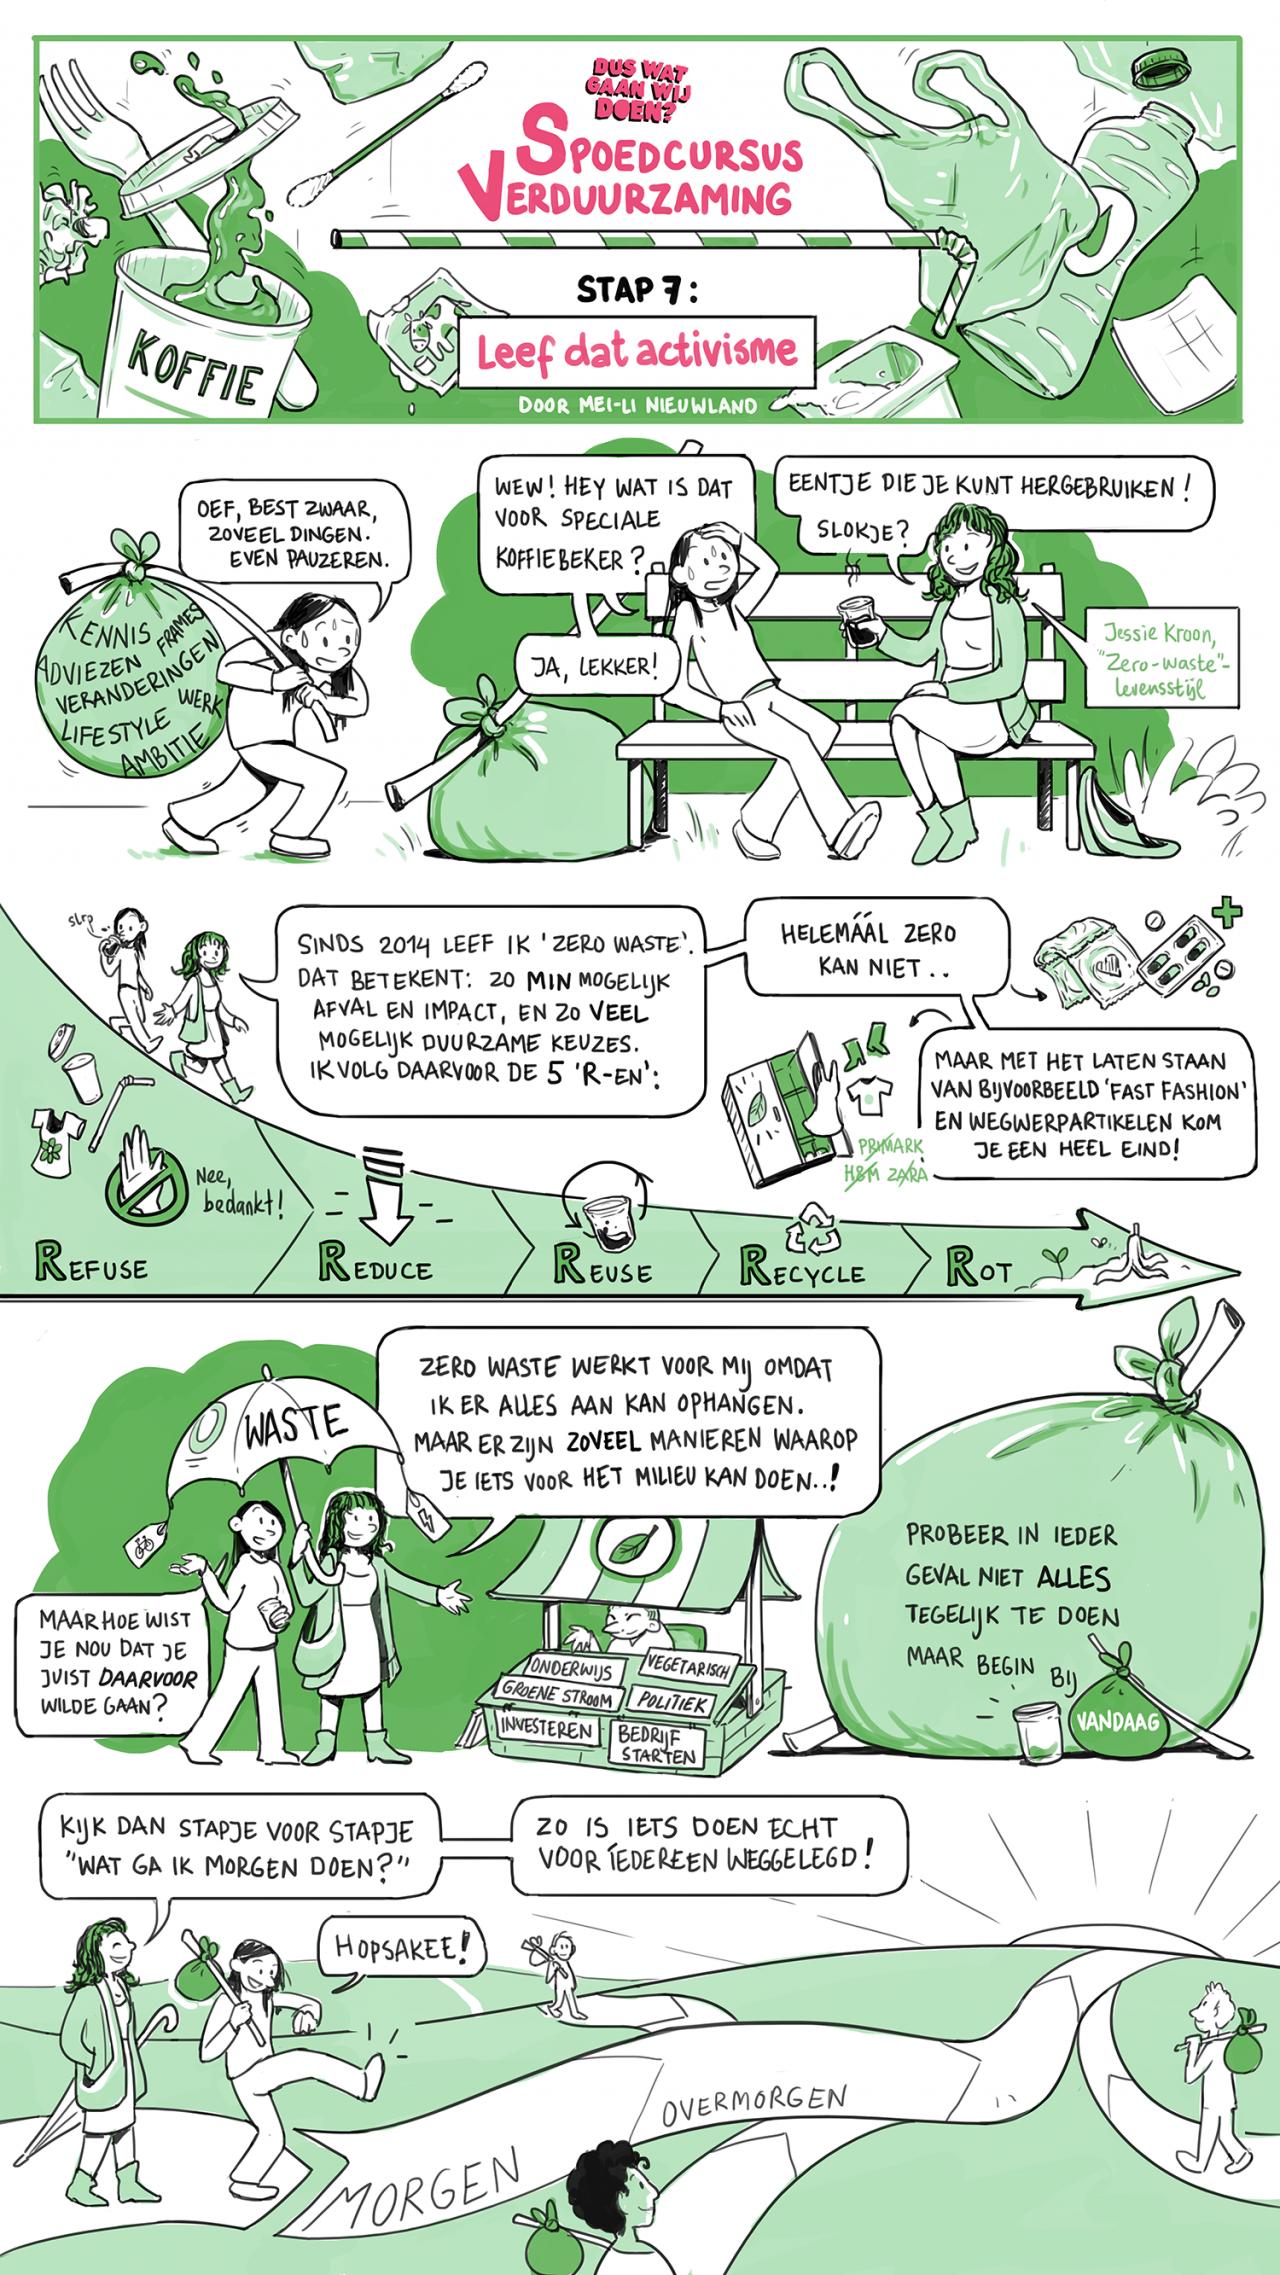 Stap 7: leef dat activisme